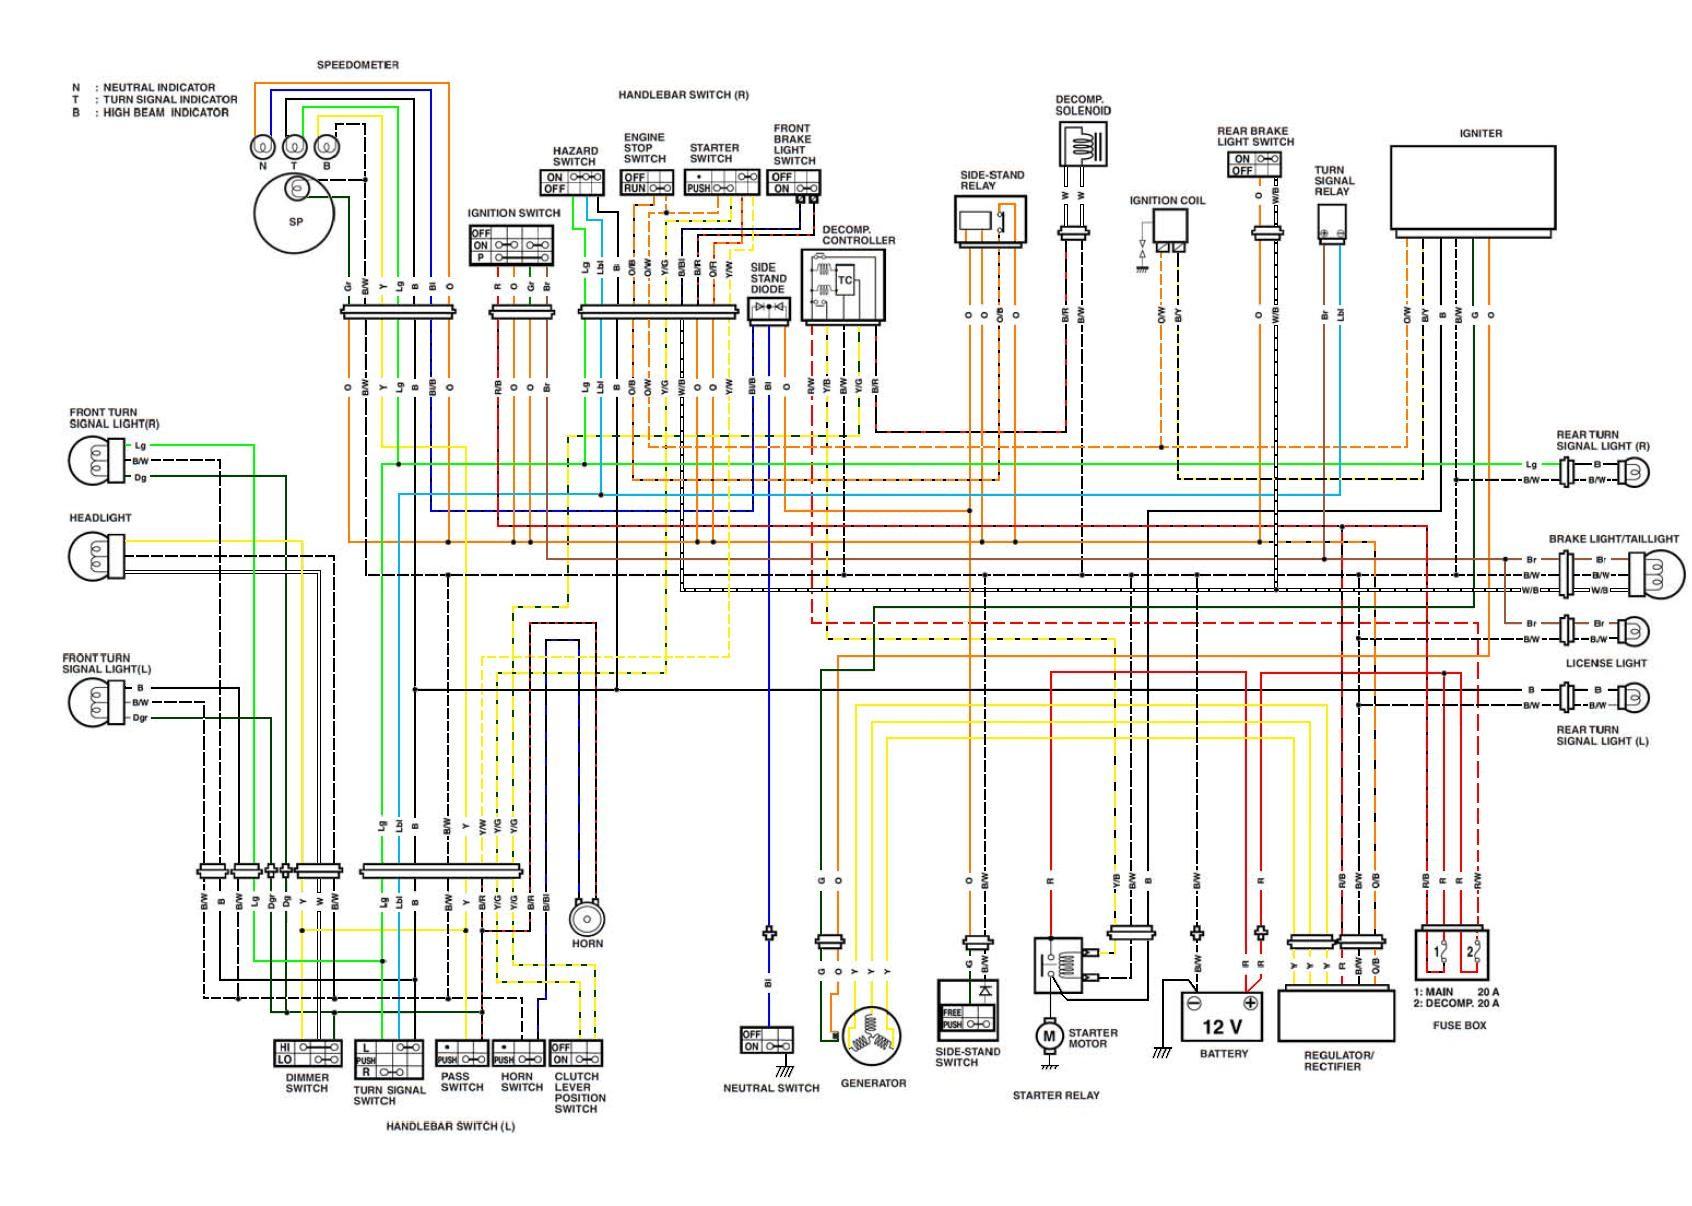 Harley Davidson Dyna Super Glide Wiring Diagram | Wiring